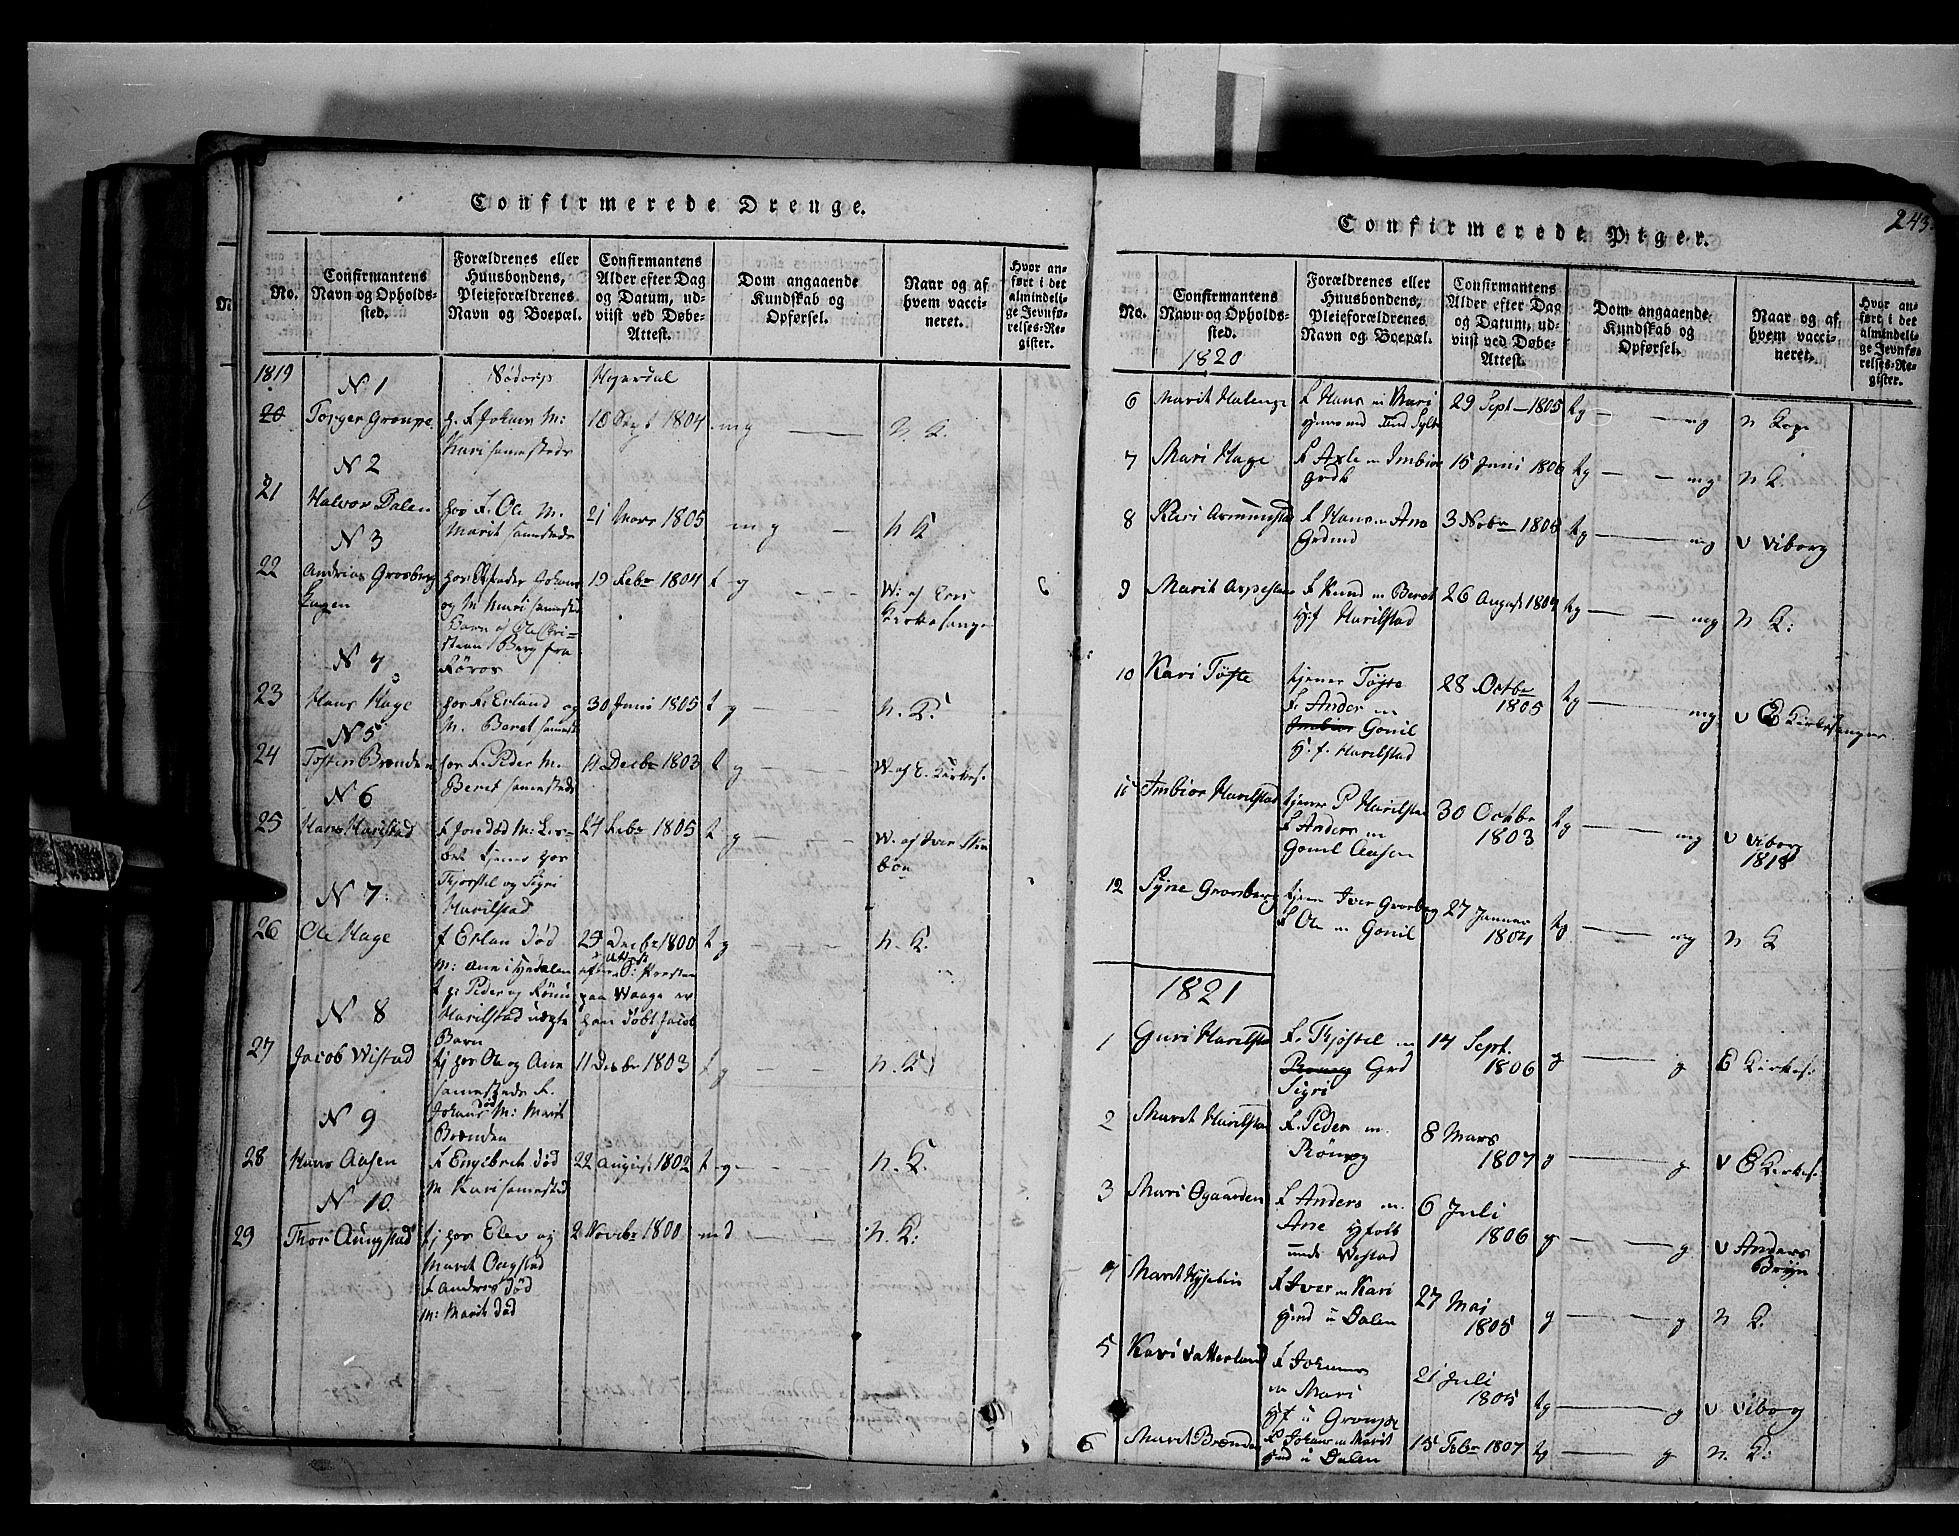 SAH, Fron prestekontor, H/Ha/Hab/L0003: Klokkerbok nr. 3, 1816-1850, s. 243